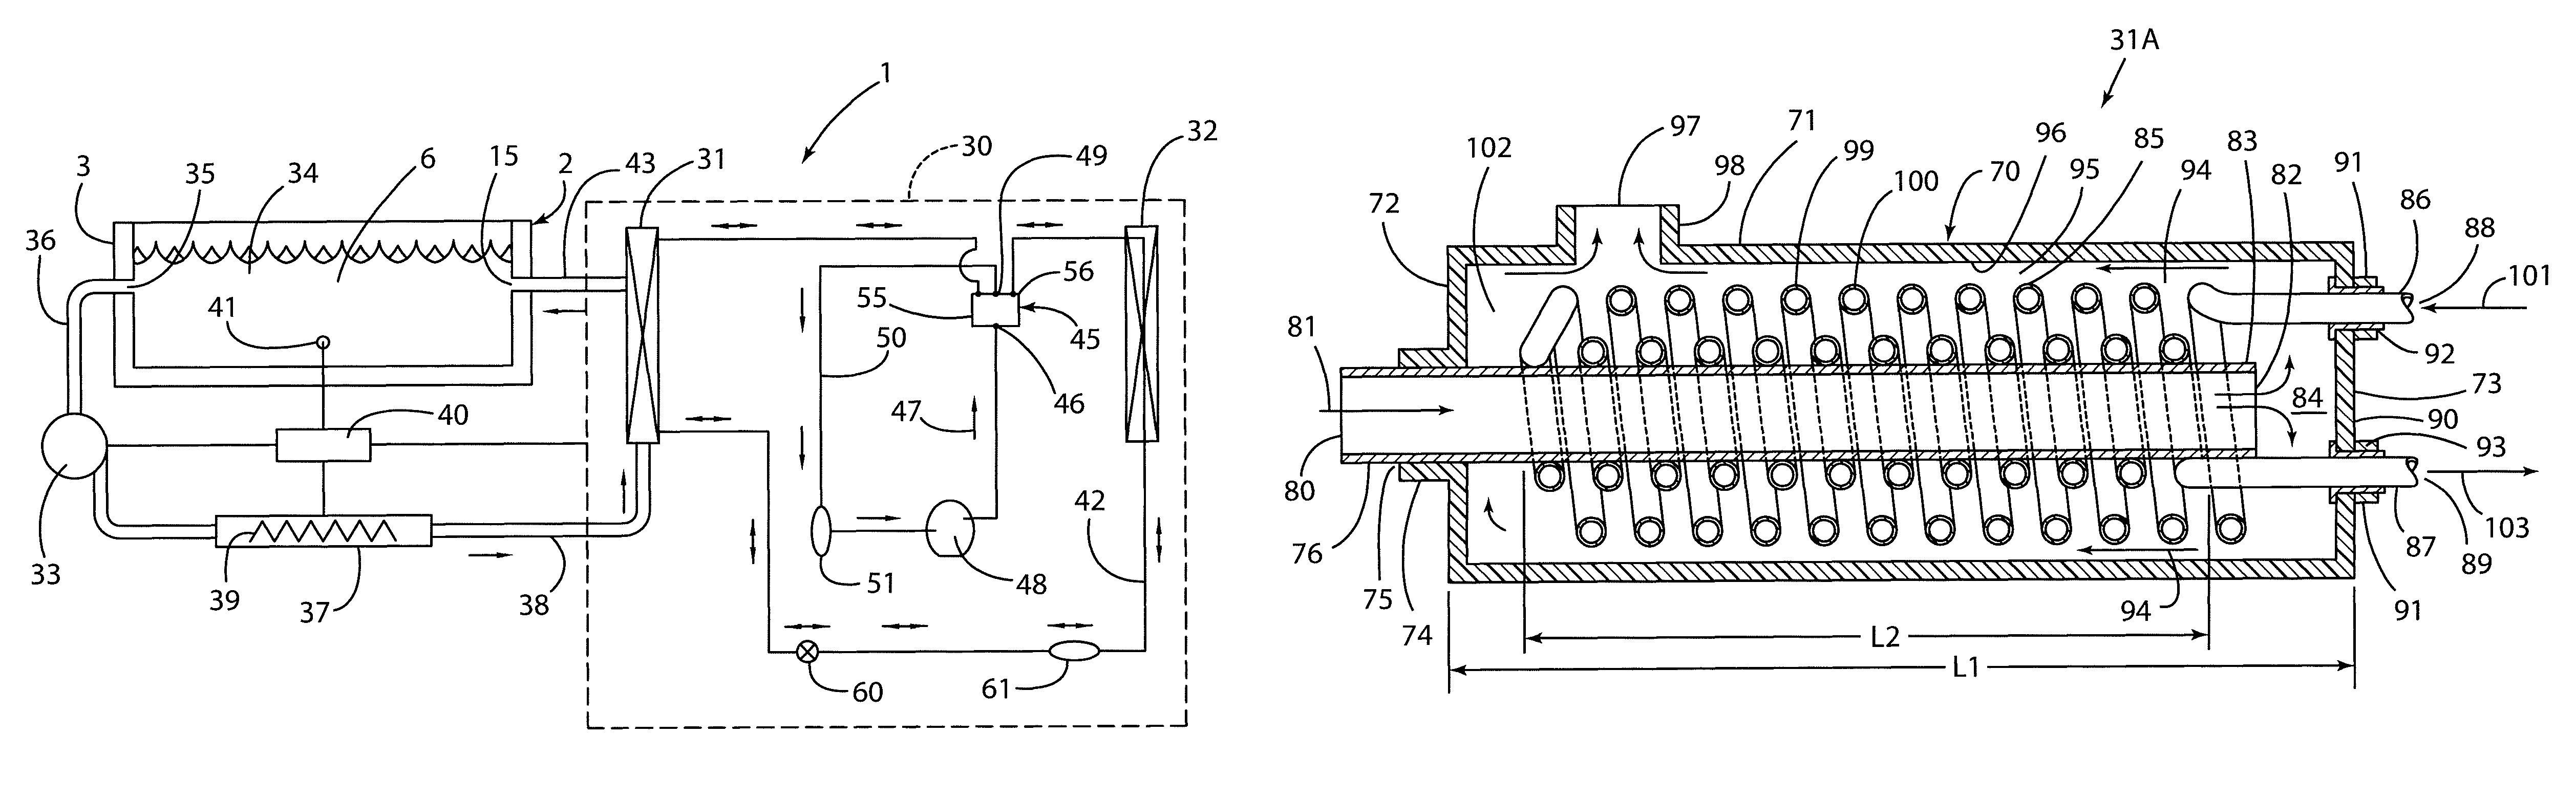 Patent Us8214936 Spa Having Heat Pump System Google Patents Saturn Lw300 Engine Piston Diagram Drawing